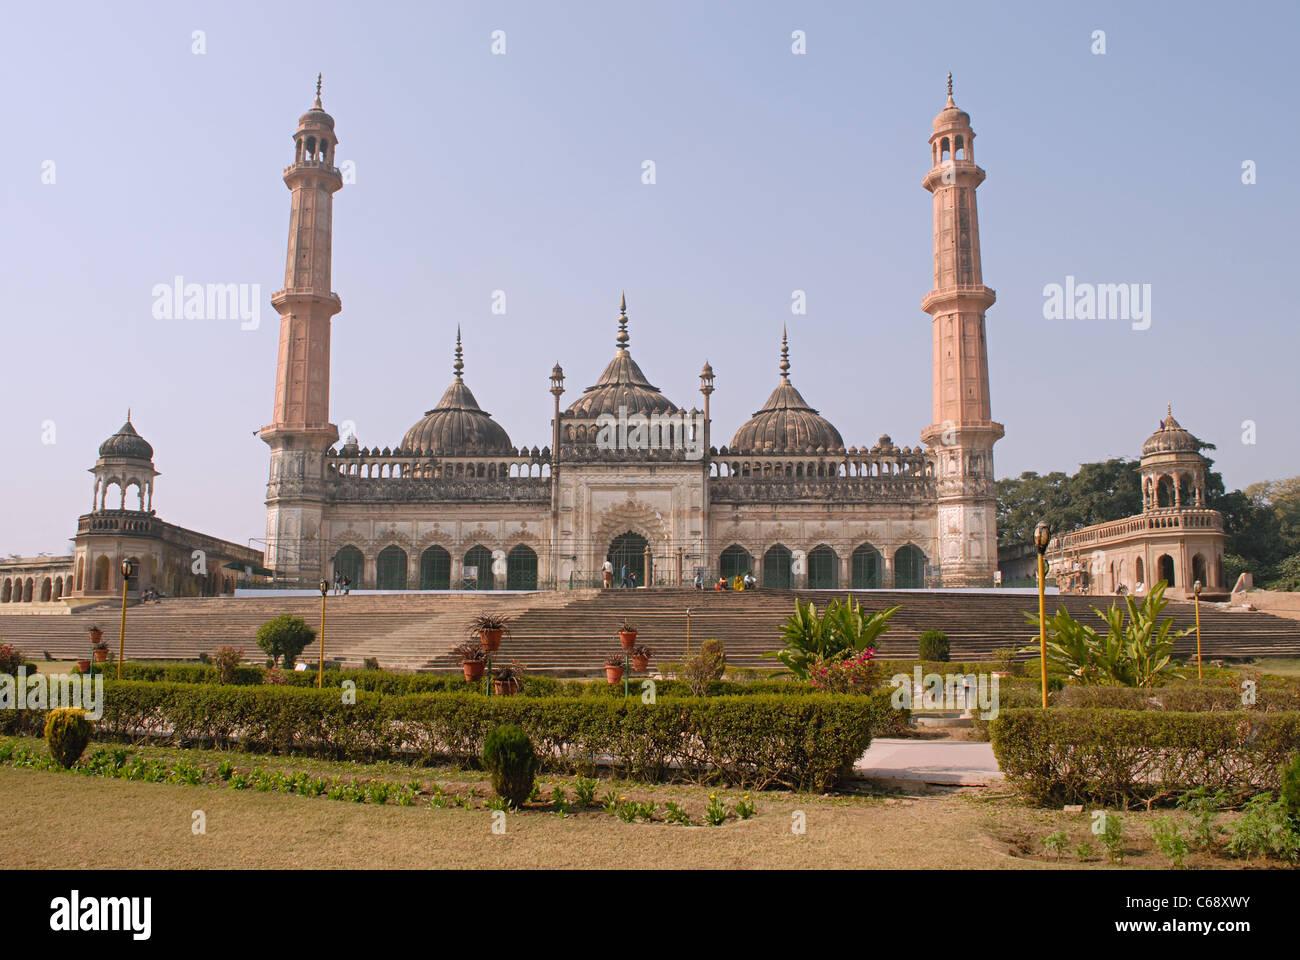 Asfi Masjid in Bara Imambara, Lucknow, Utter Pradesh, India - Stock Image